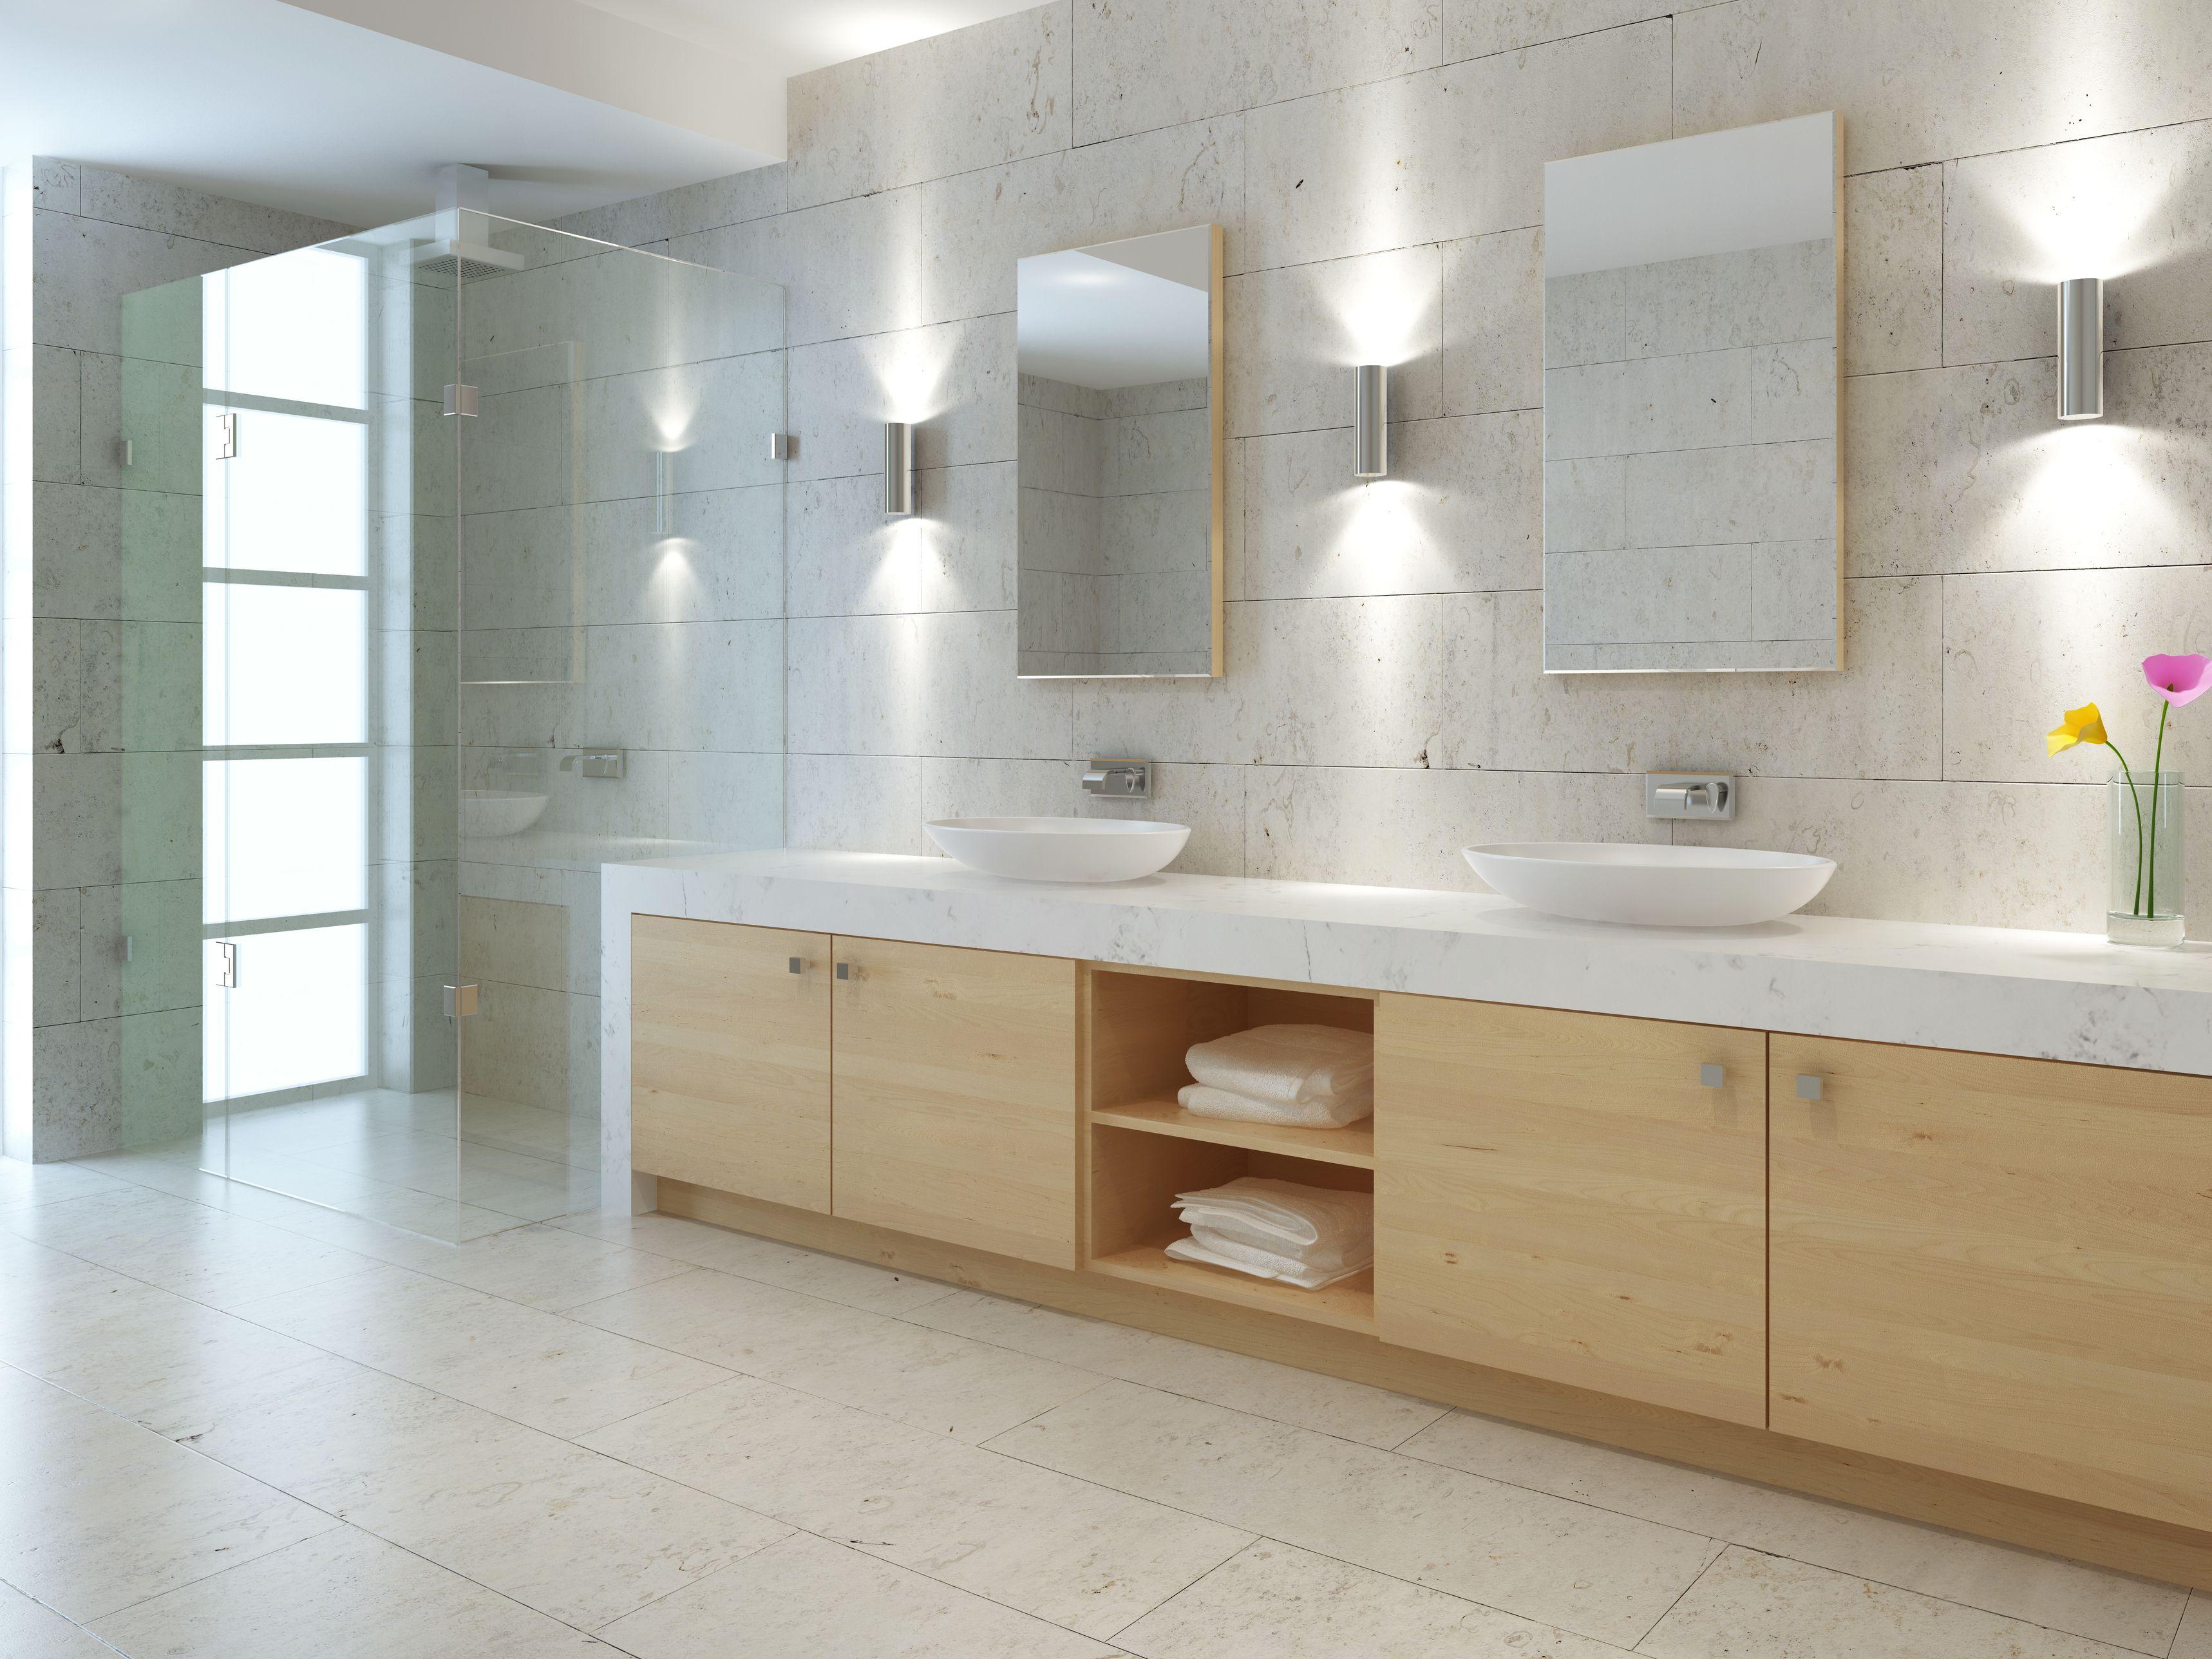 Bathroom Codes And Design Best Practices